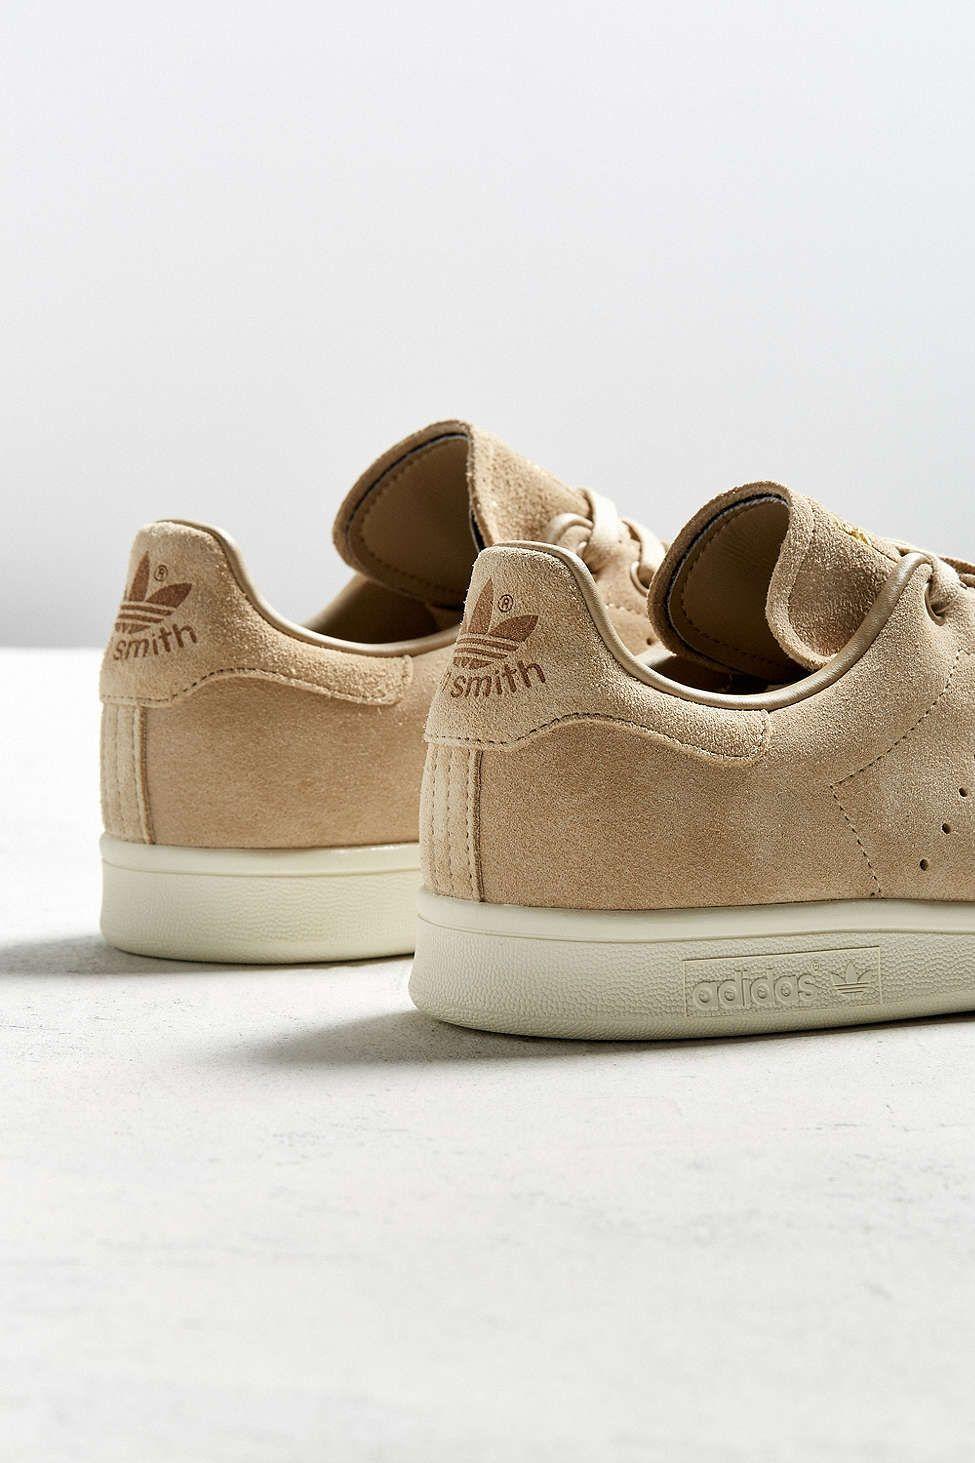 New premium look, same great shoe. #stansmith #adidasoriginals